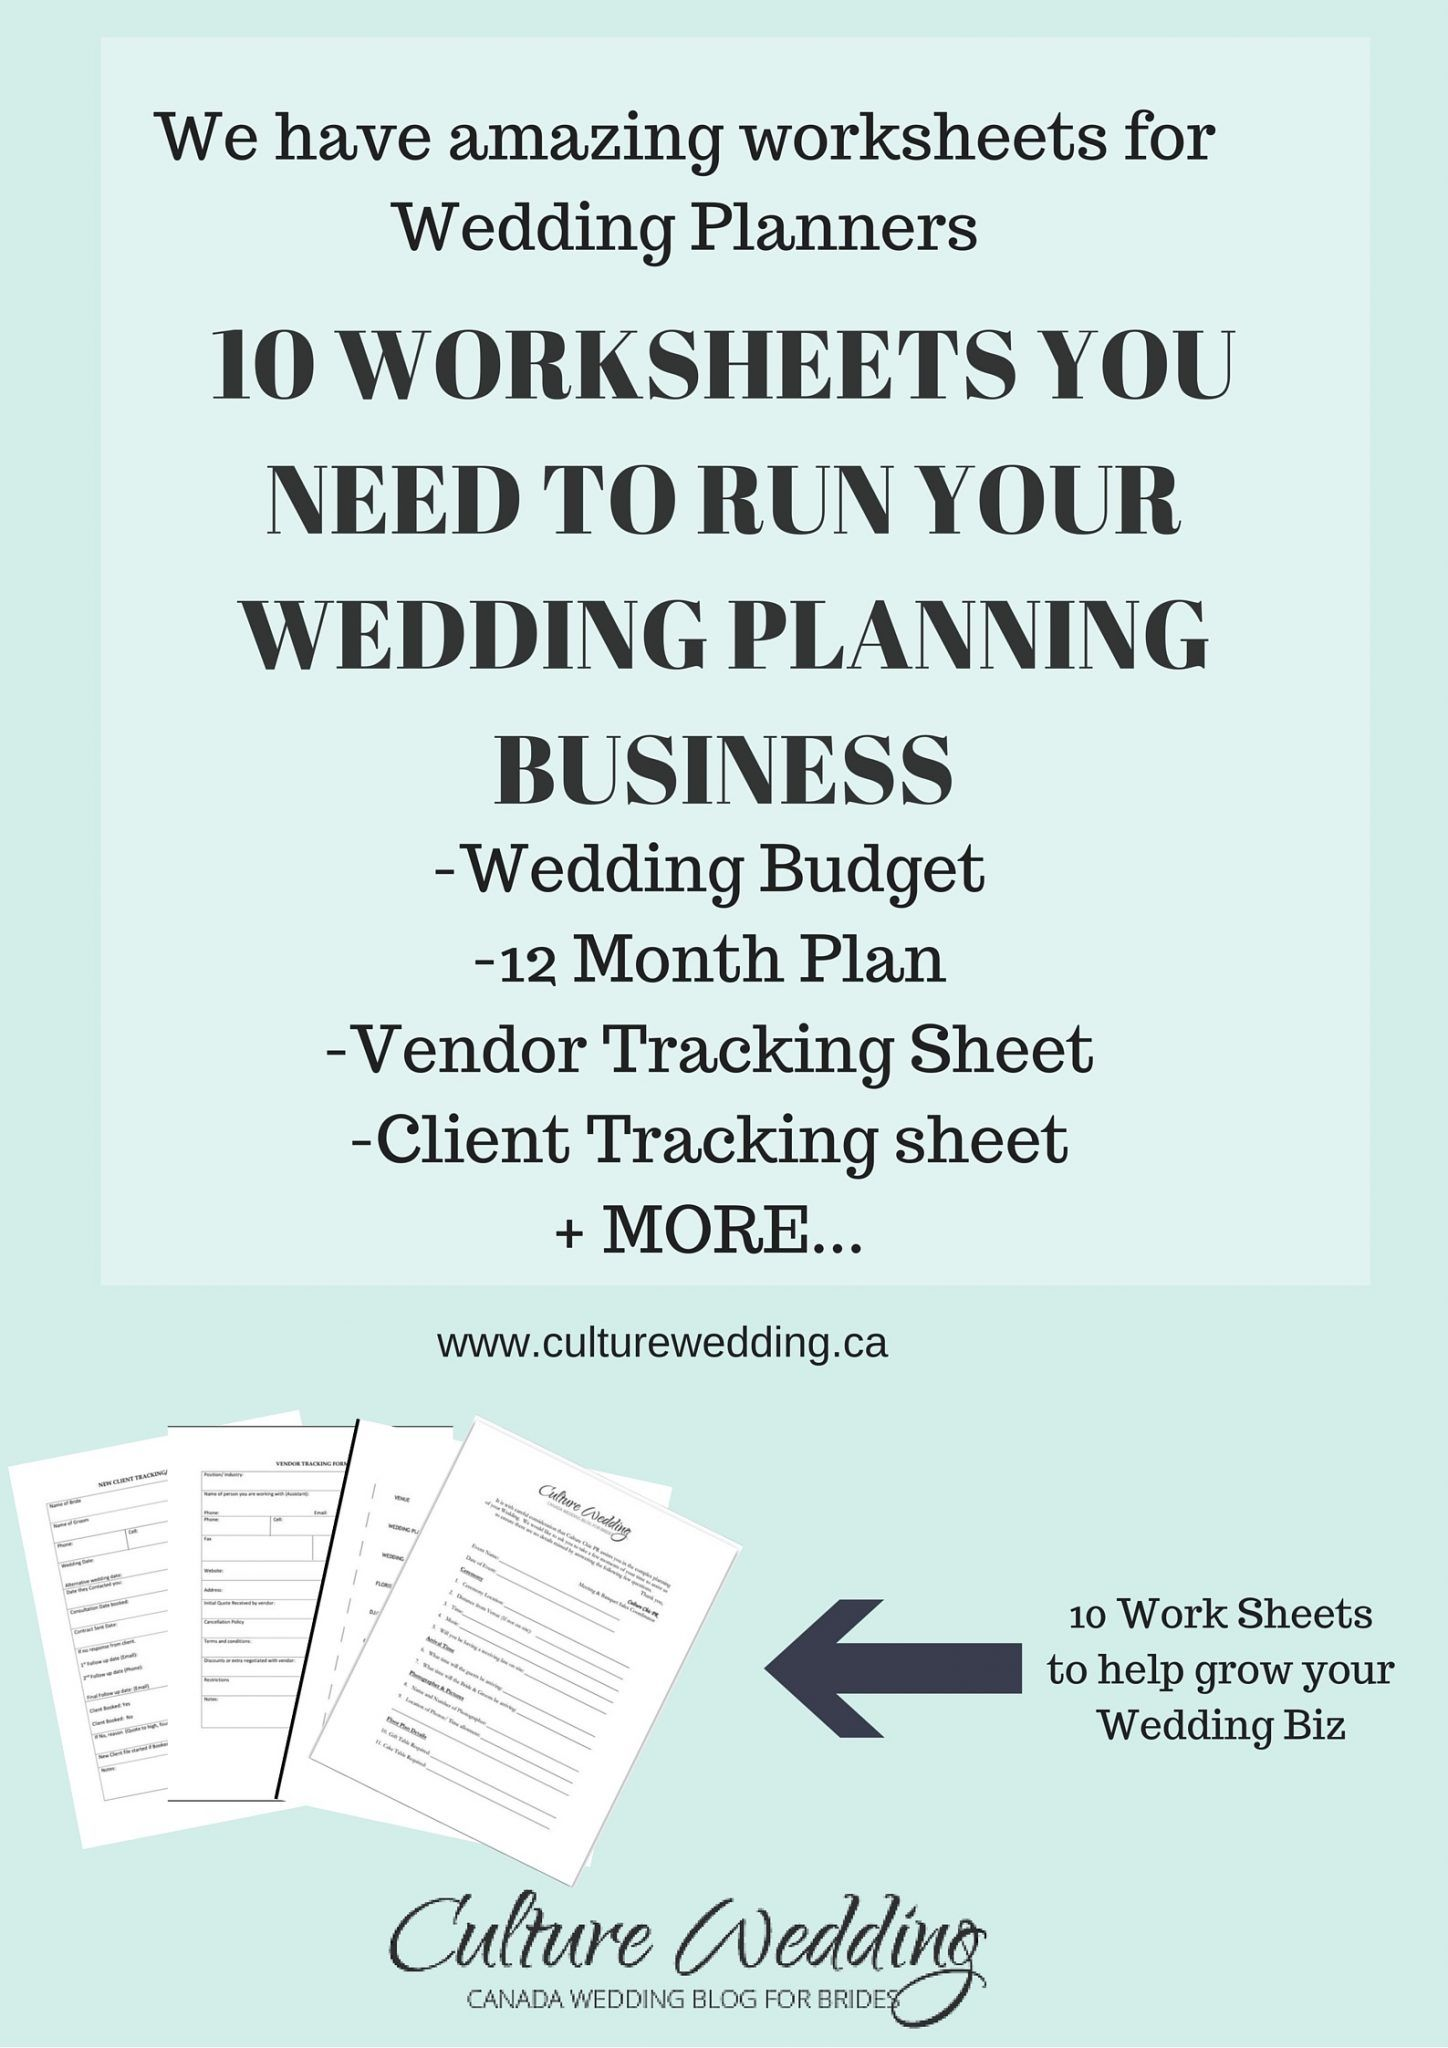 Wedding Planner Work Sheet Templates for Wedding Planners